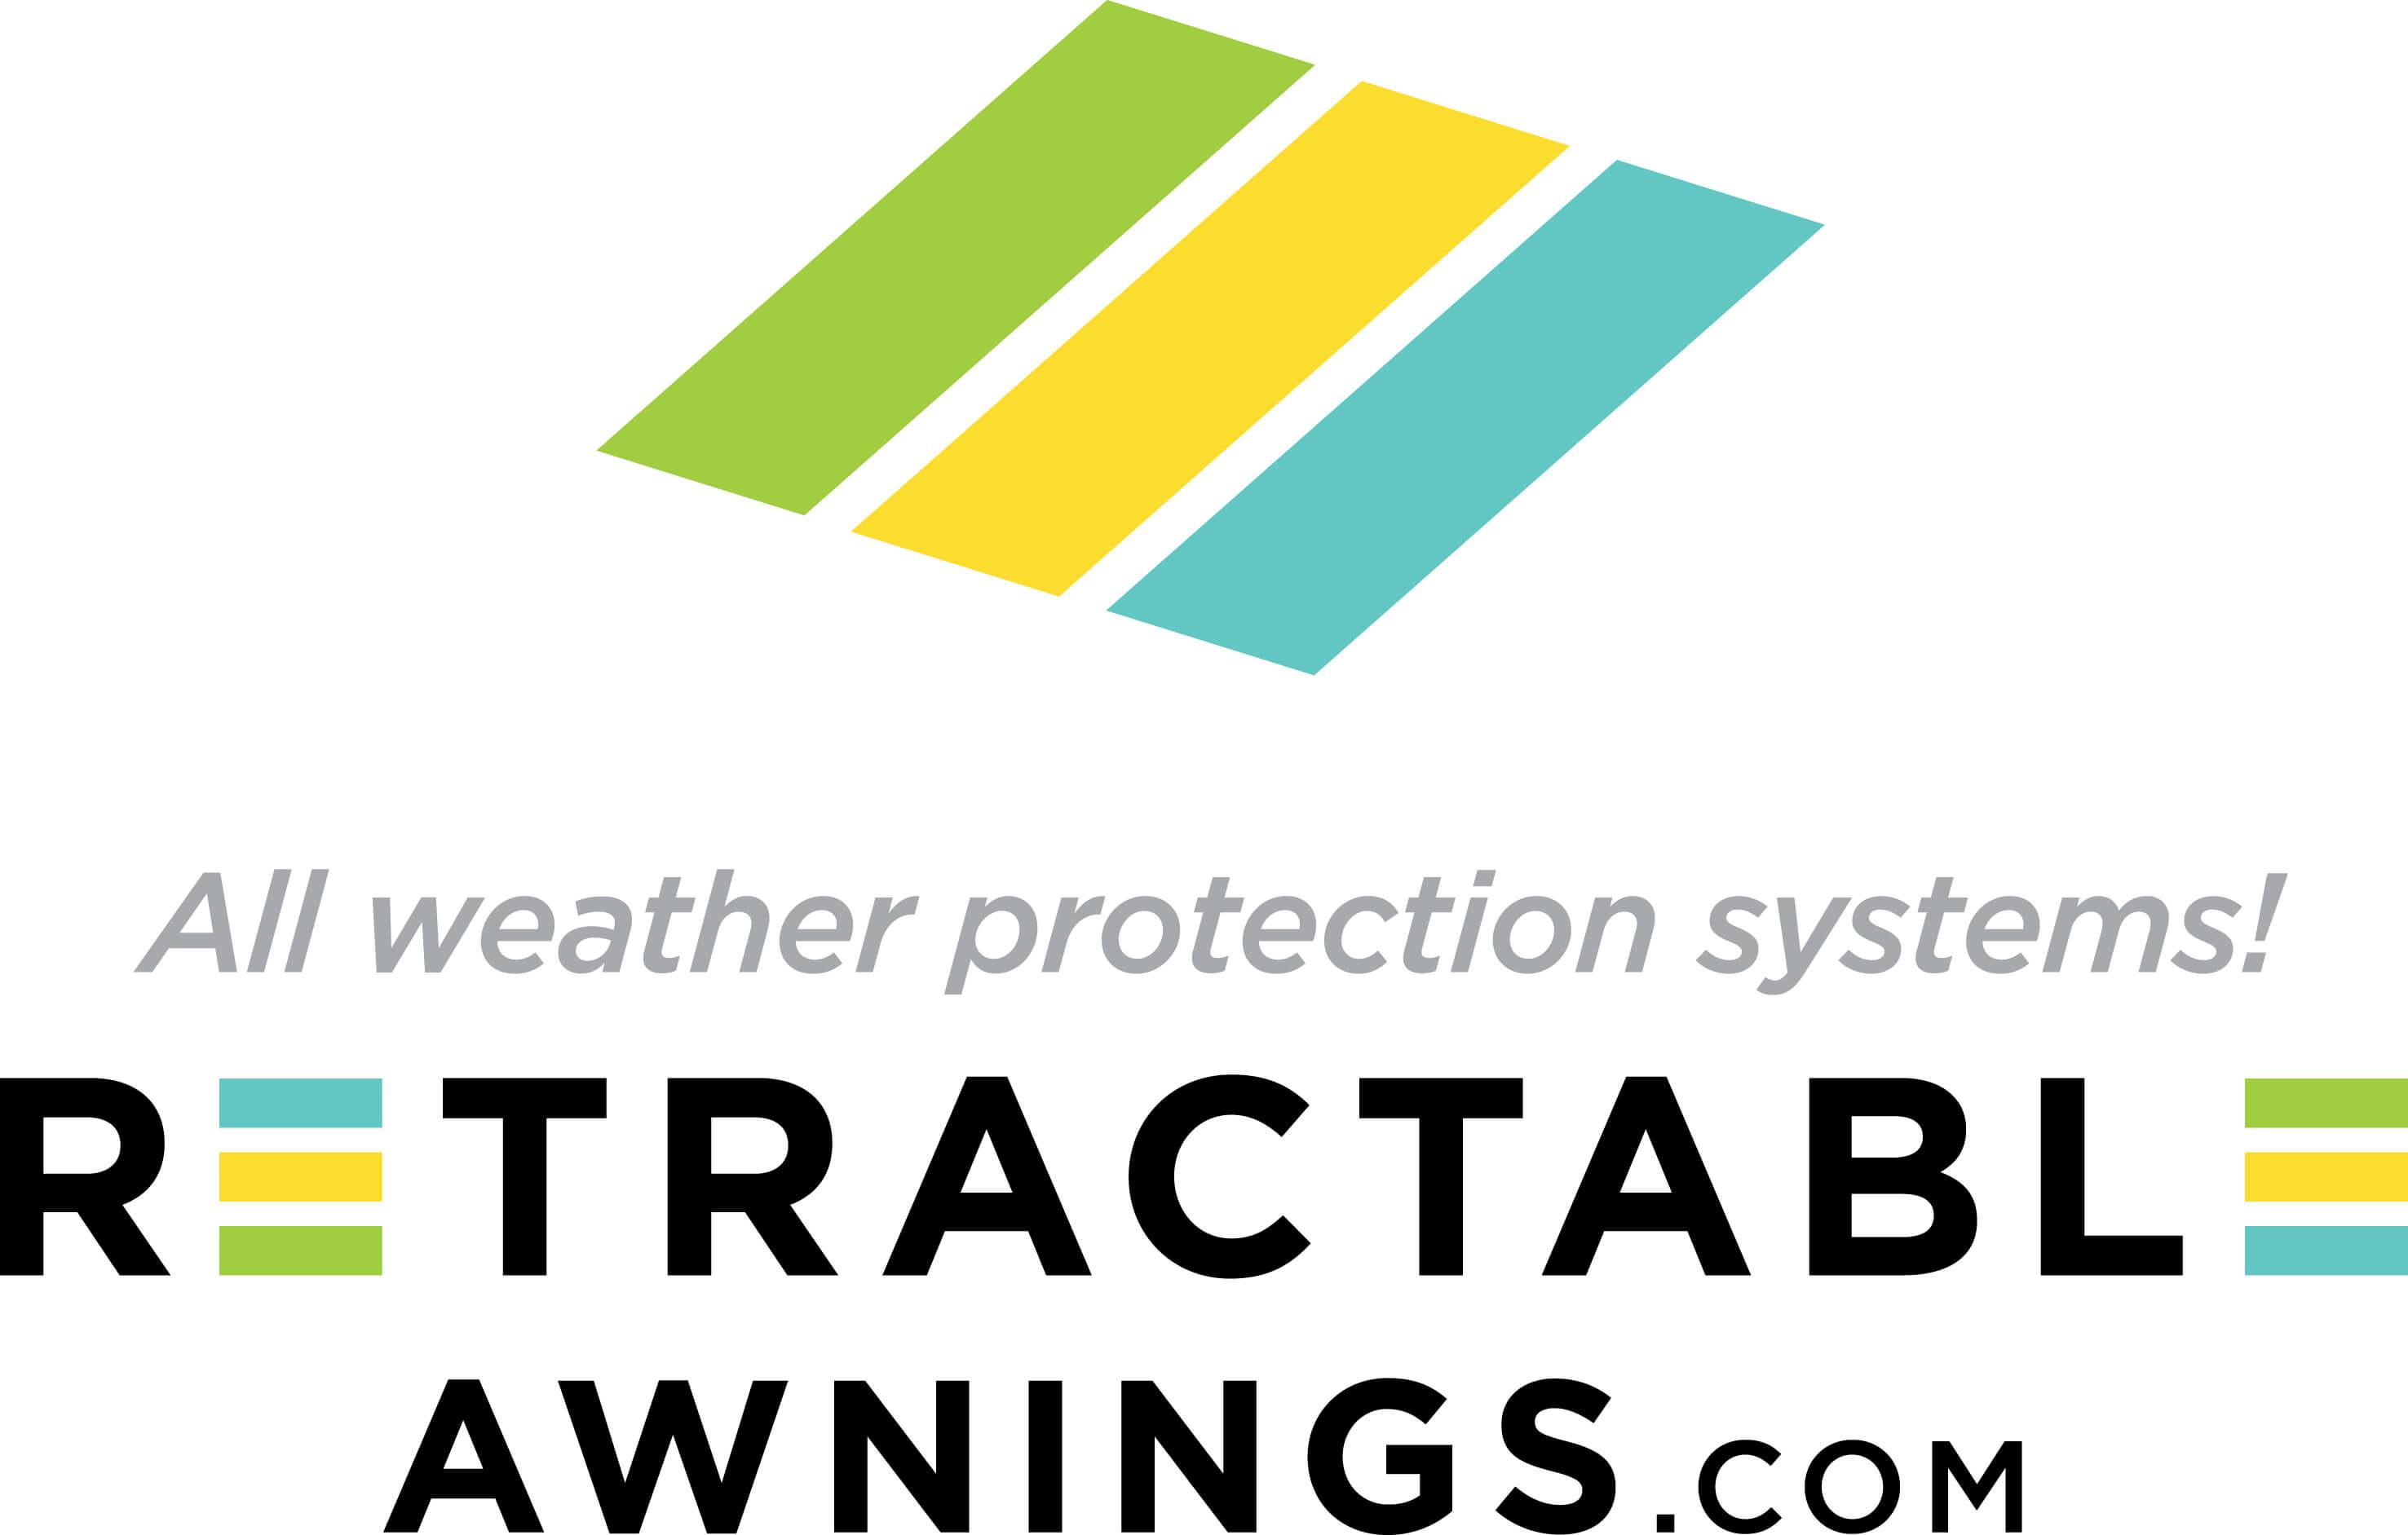 new retractableawnings.com logo vertical